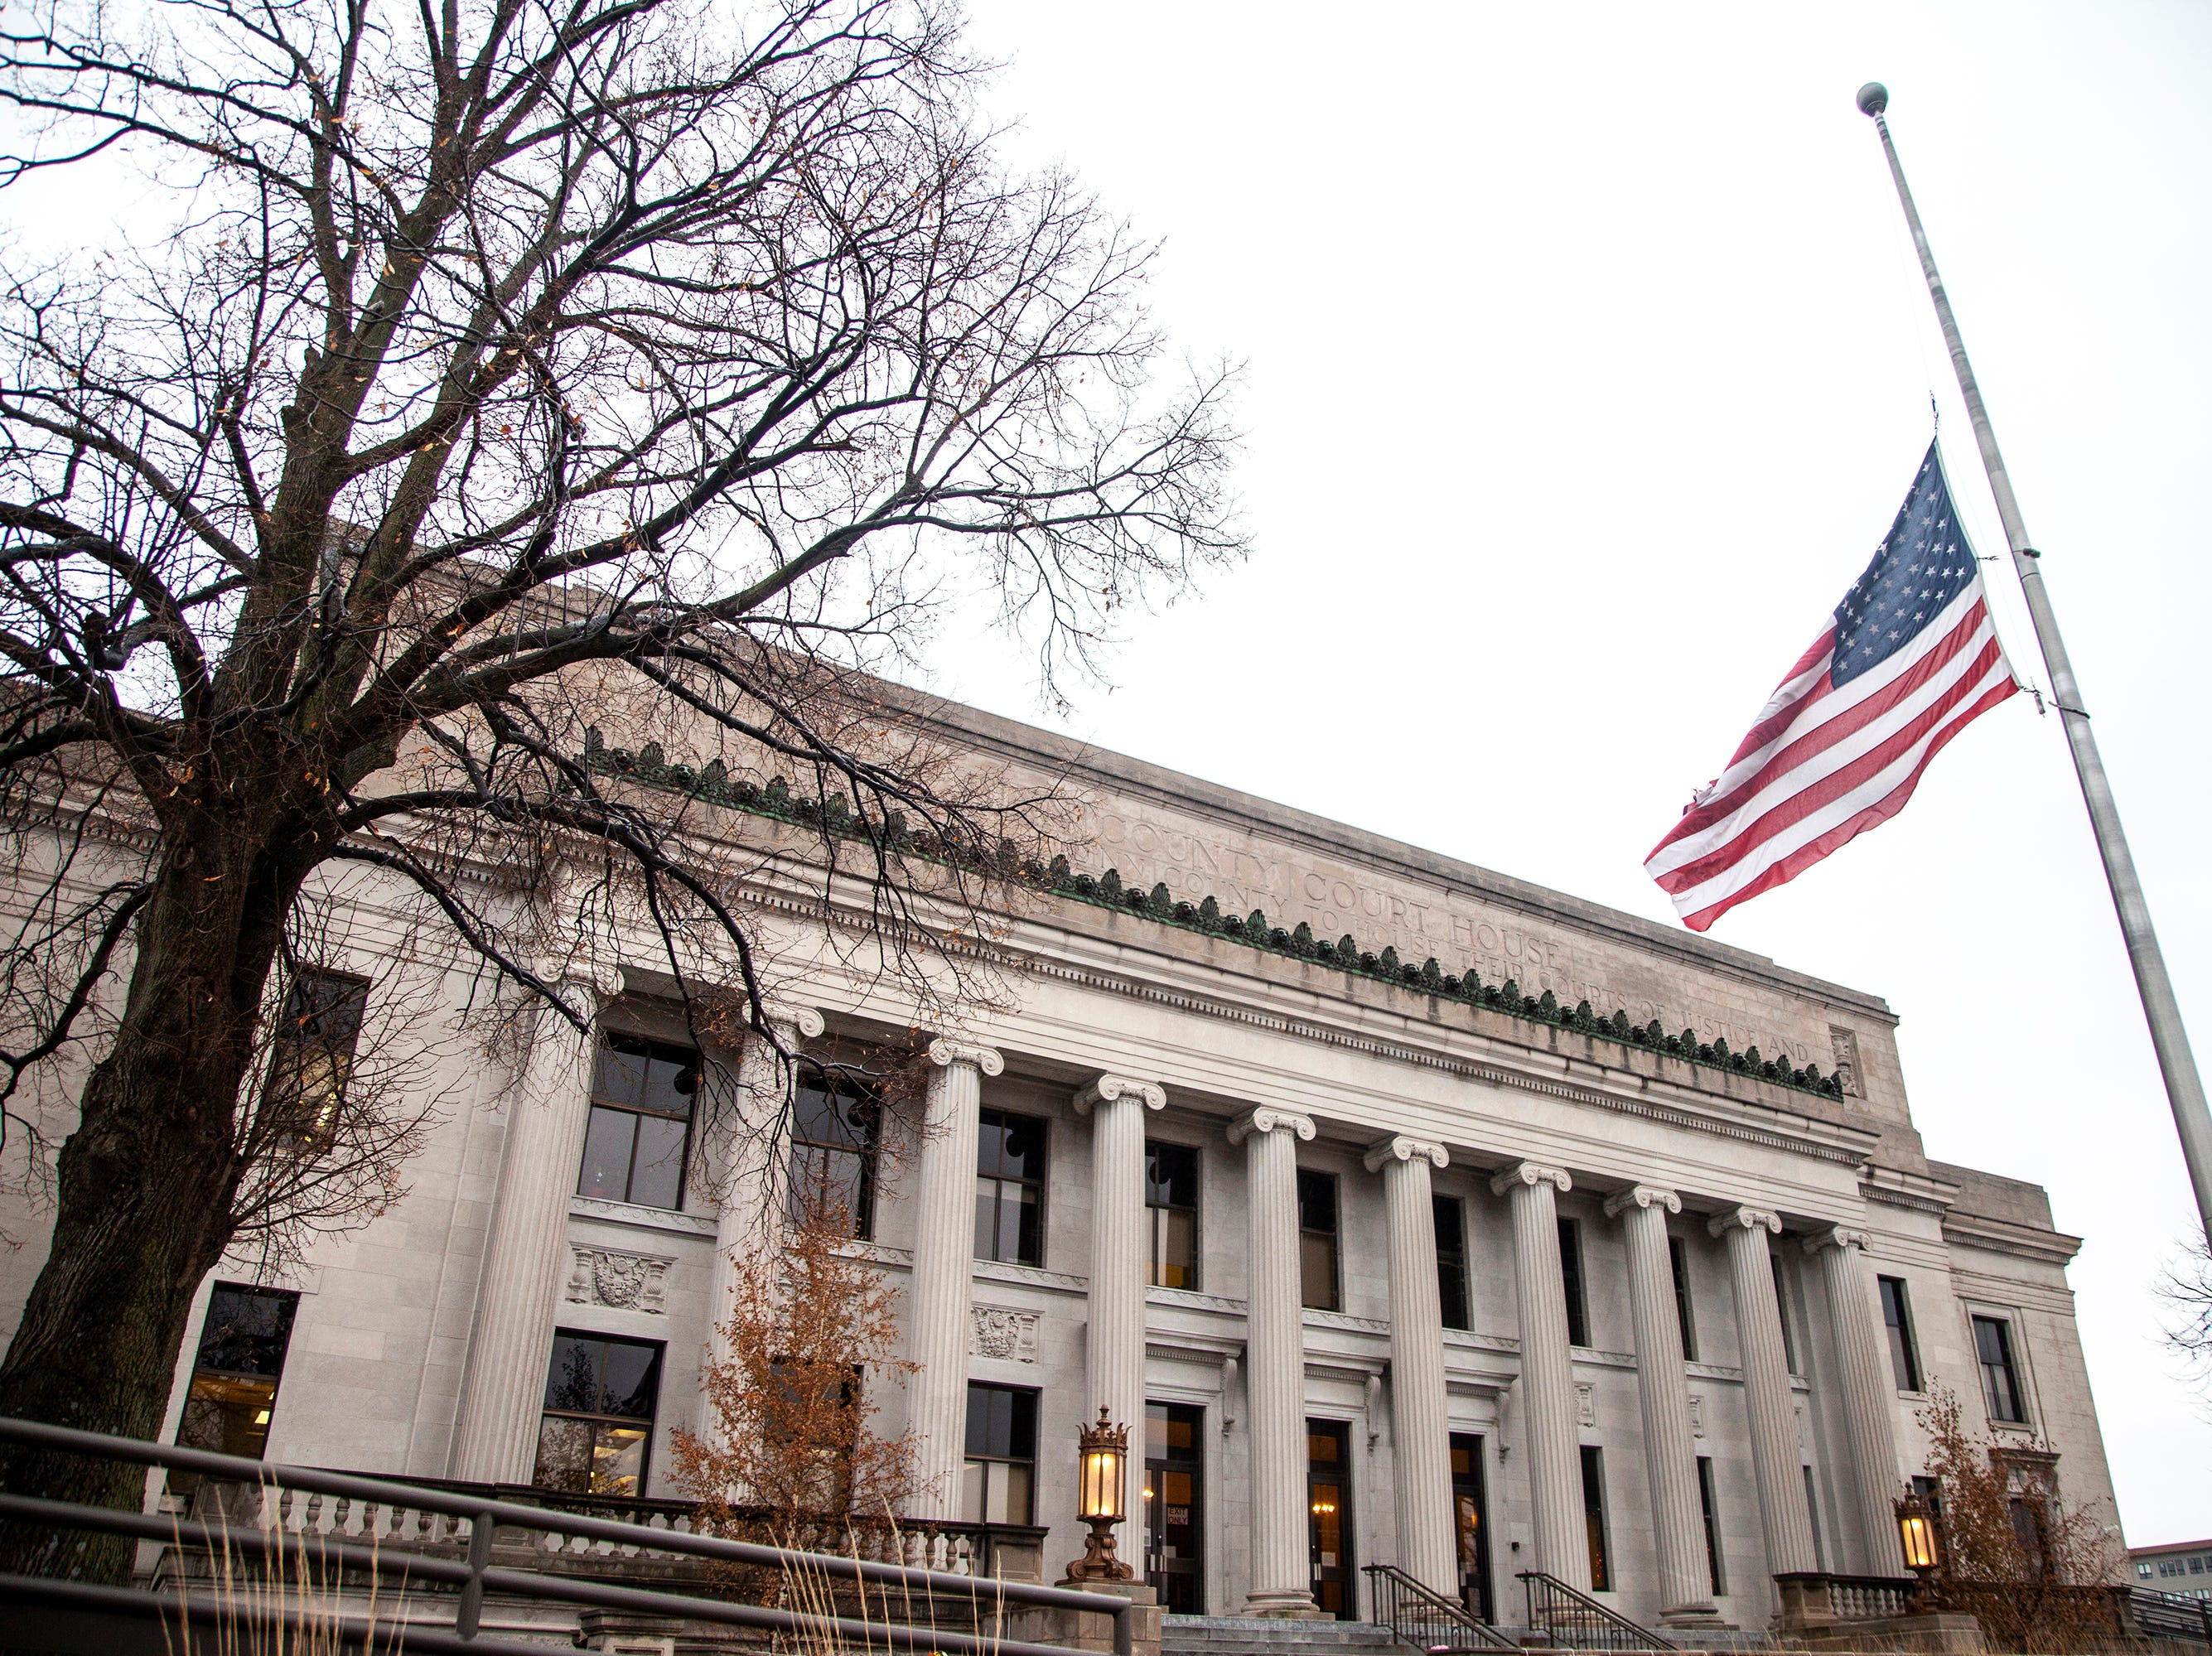 Linn County Courthouse is seen on Thursday, Dec. 20, 2018, at 51 3rd Avenue Bridge in Cedar Rapids.